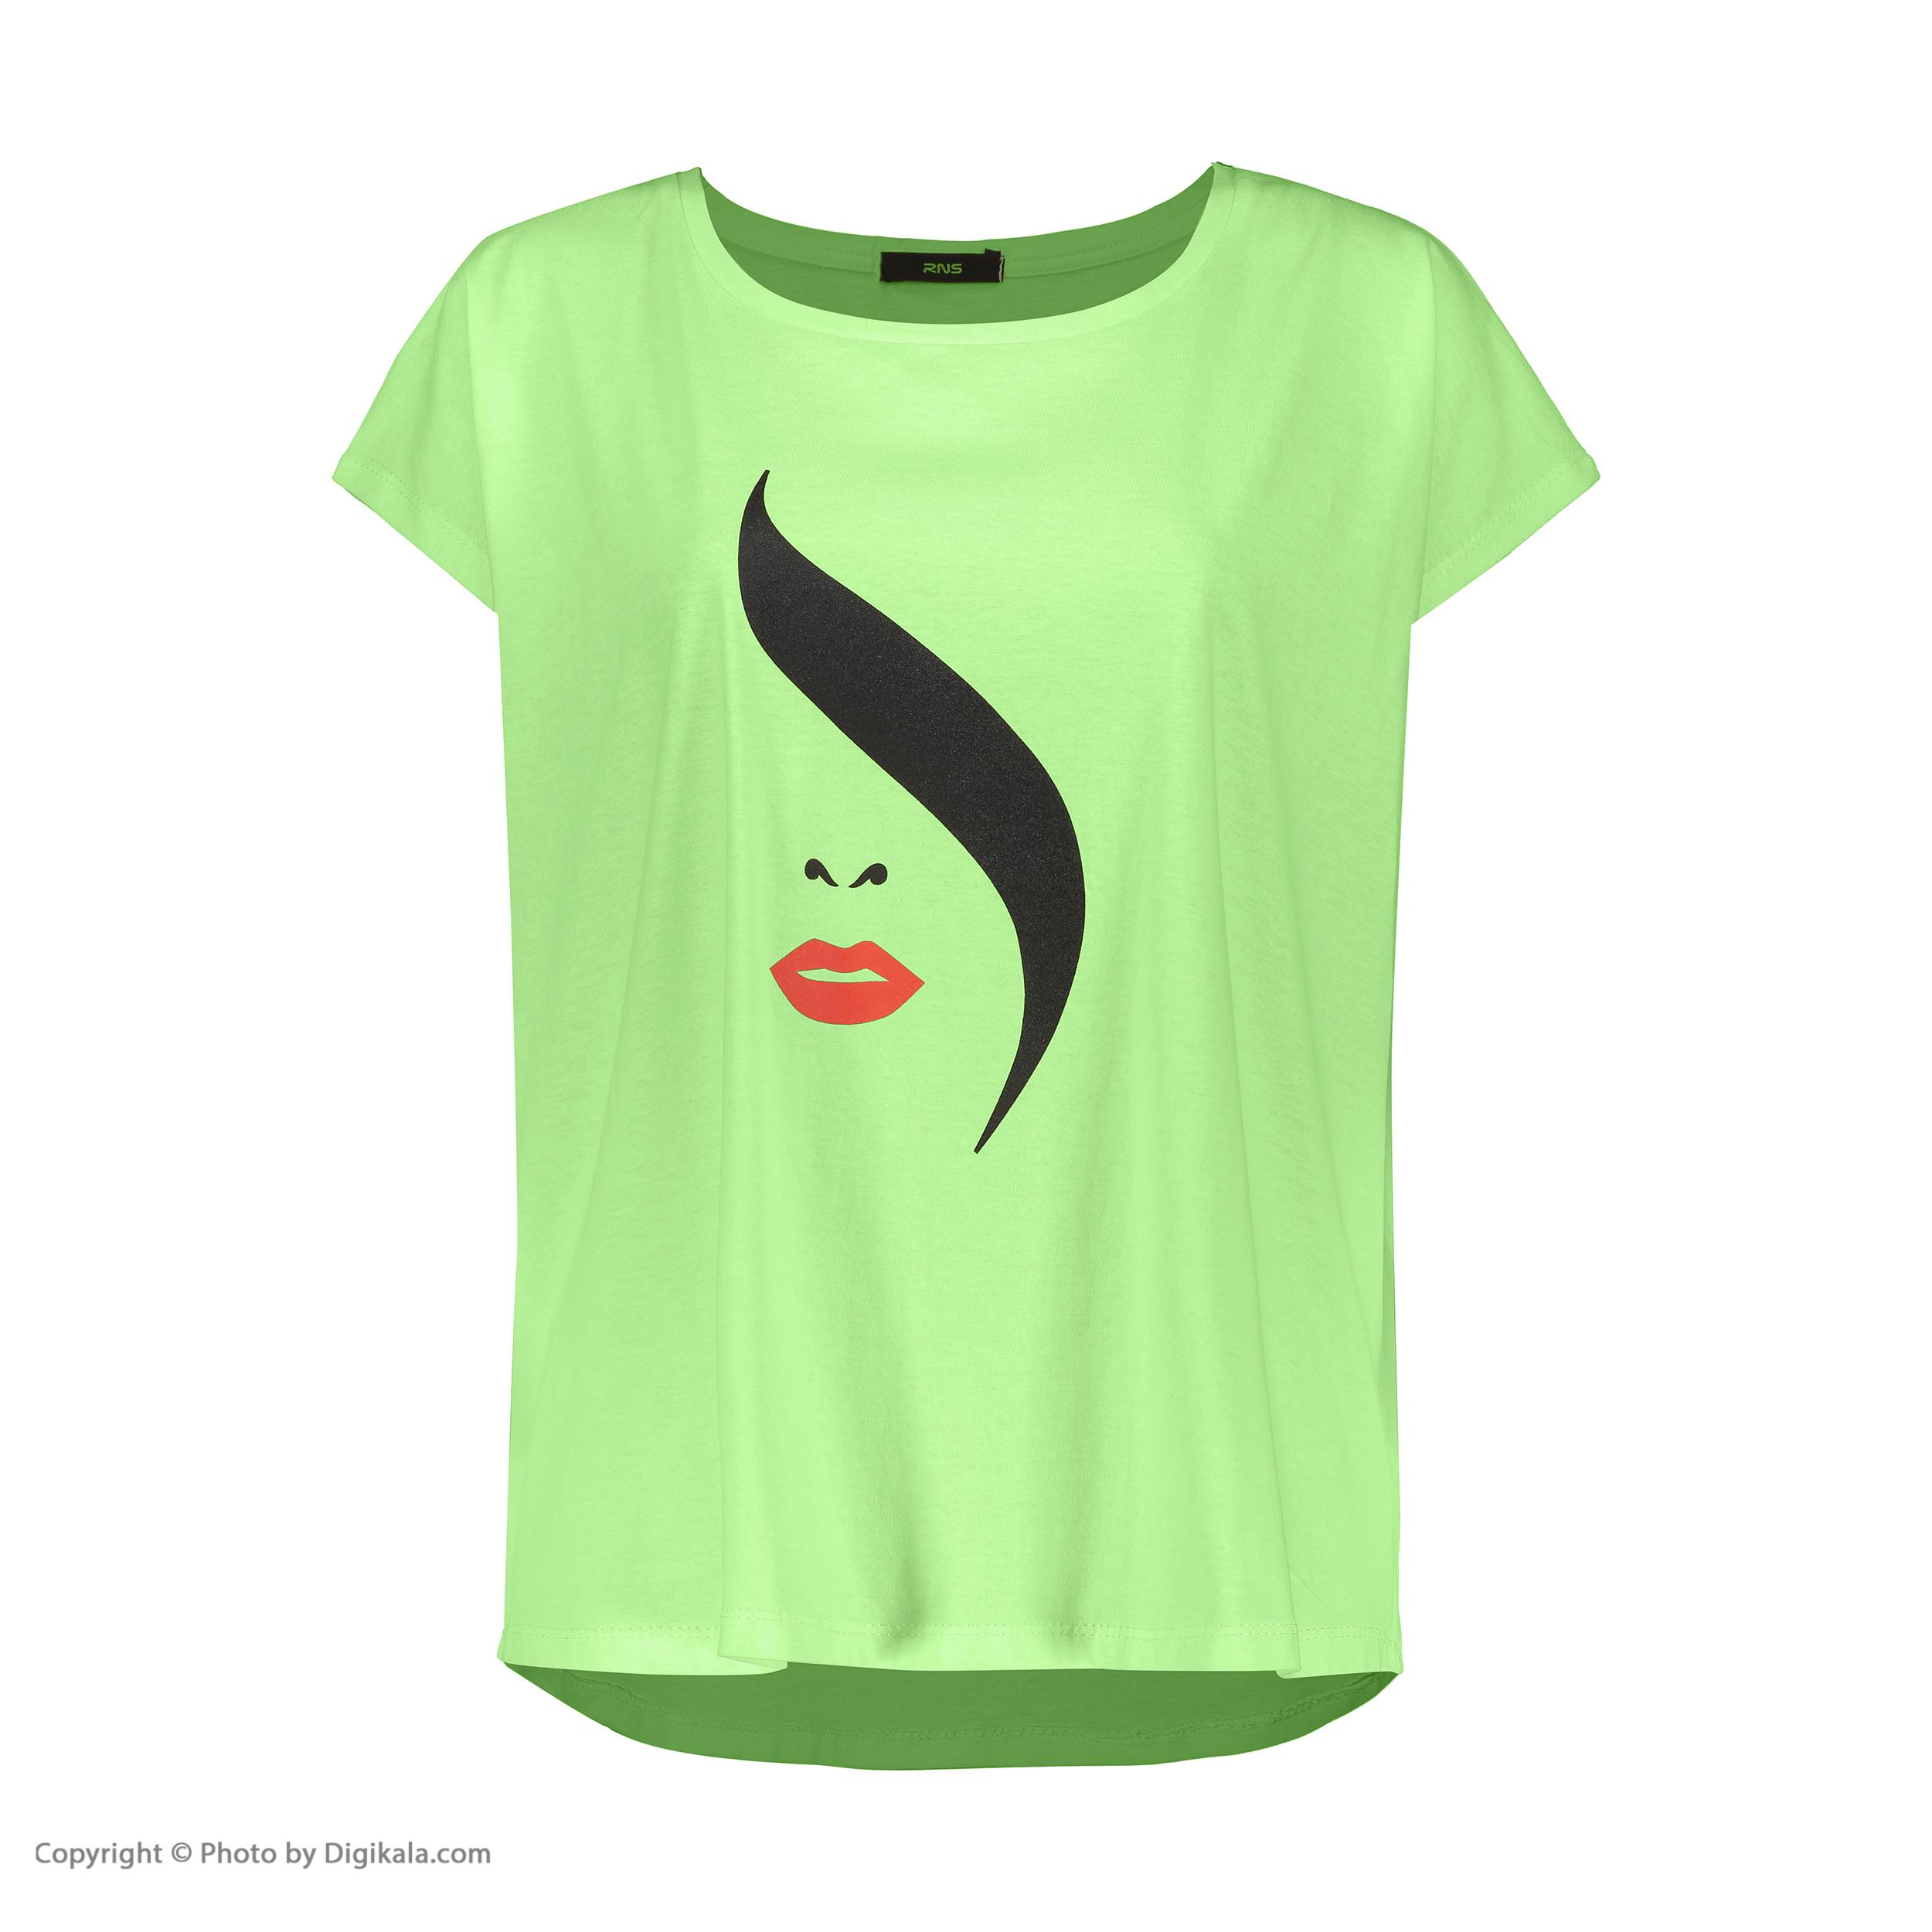 تی شرت زنانه آر ان اس مدل 1102049-43 -  - 2